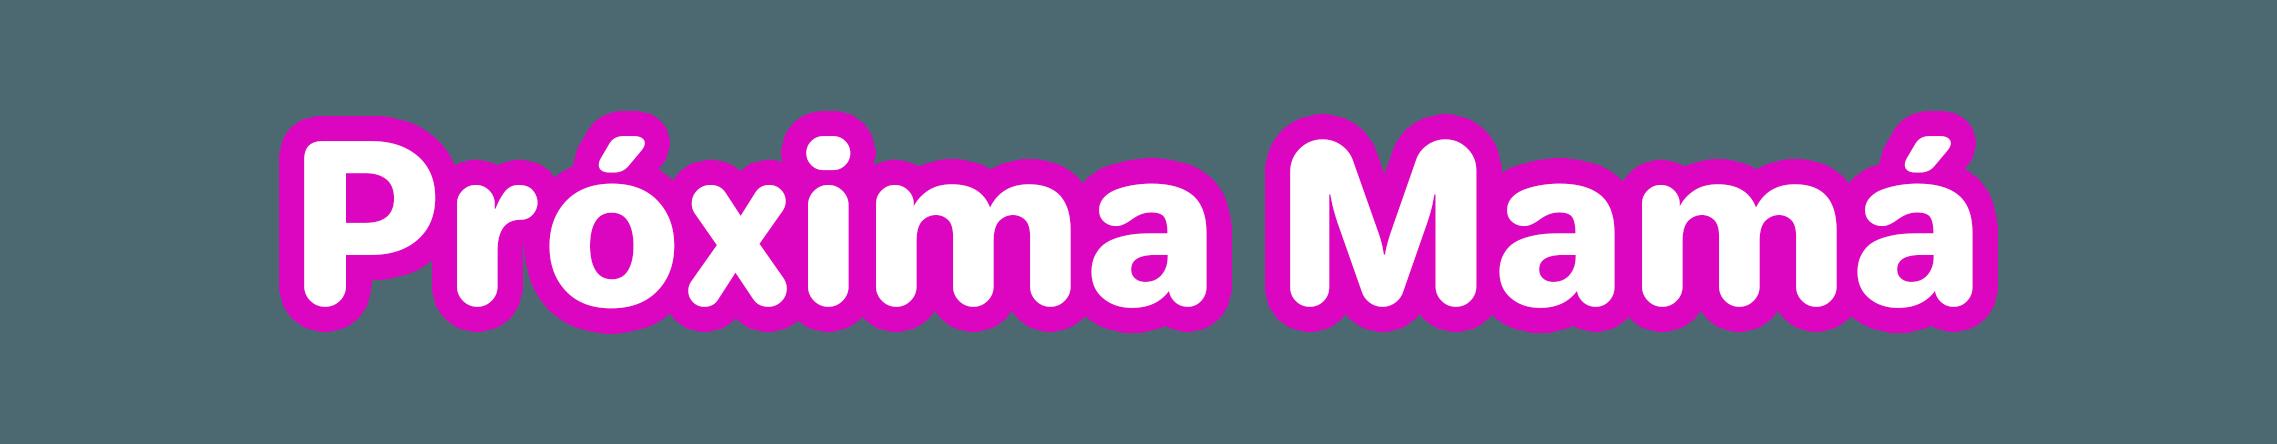 proxima-mama